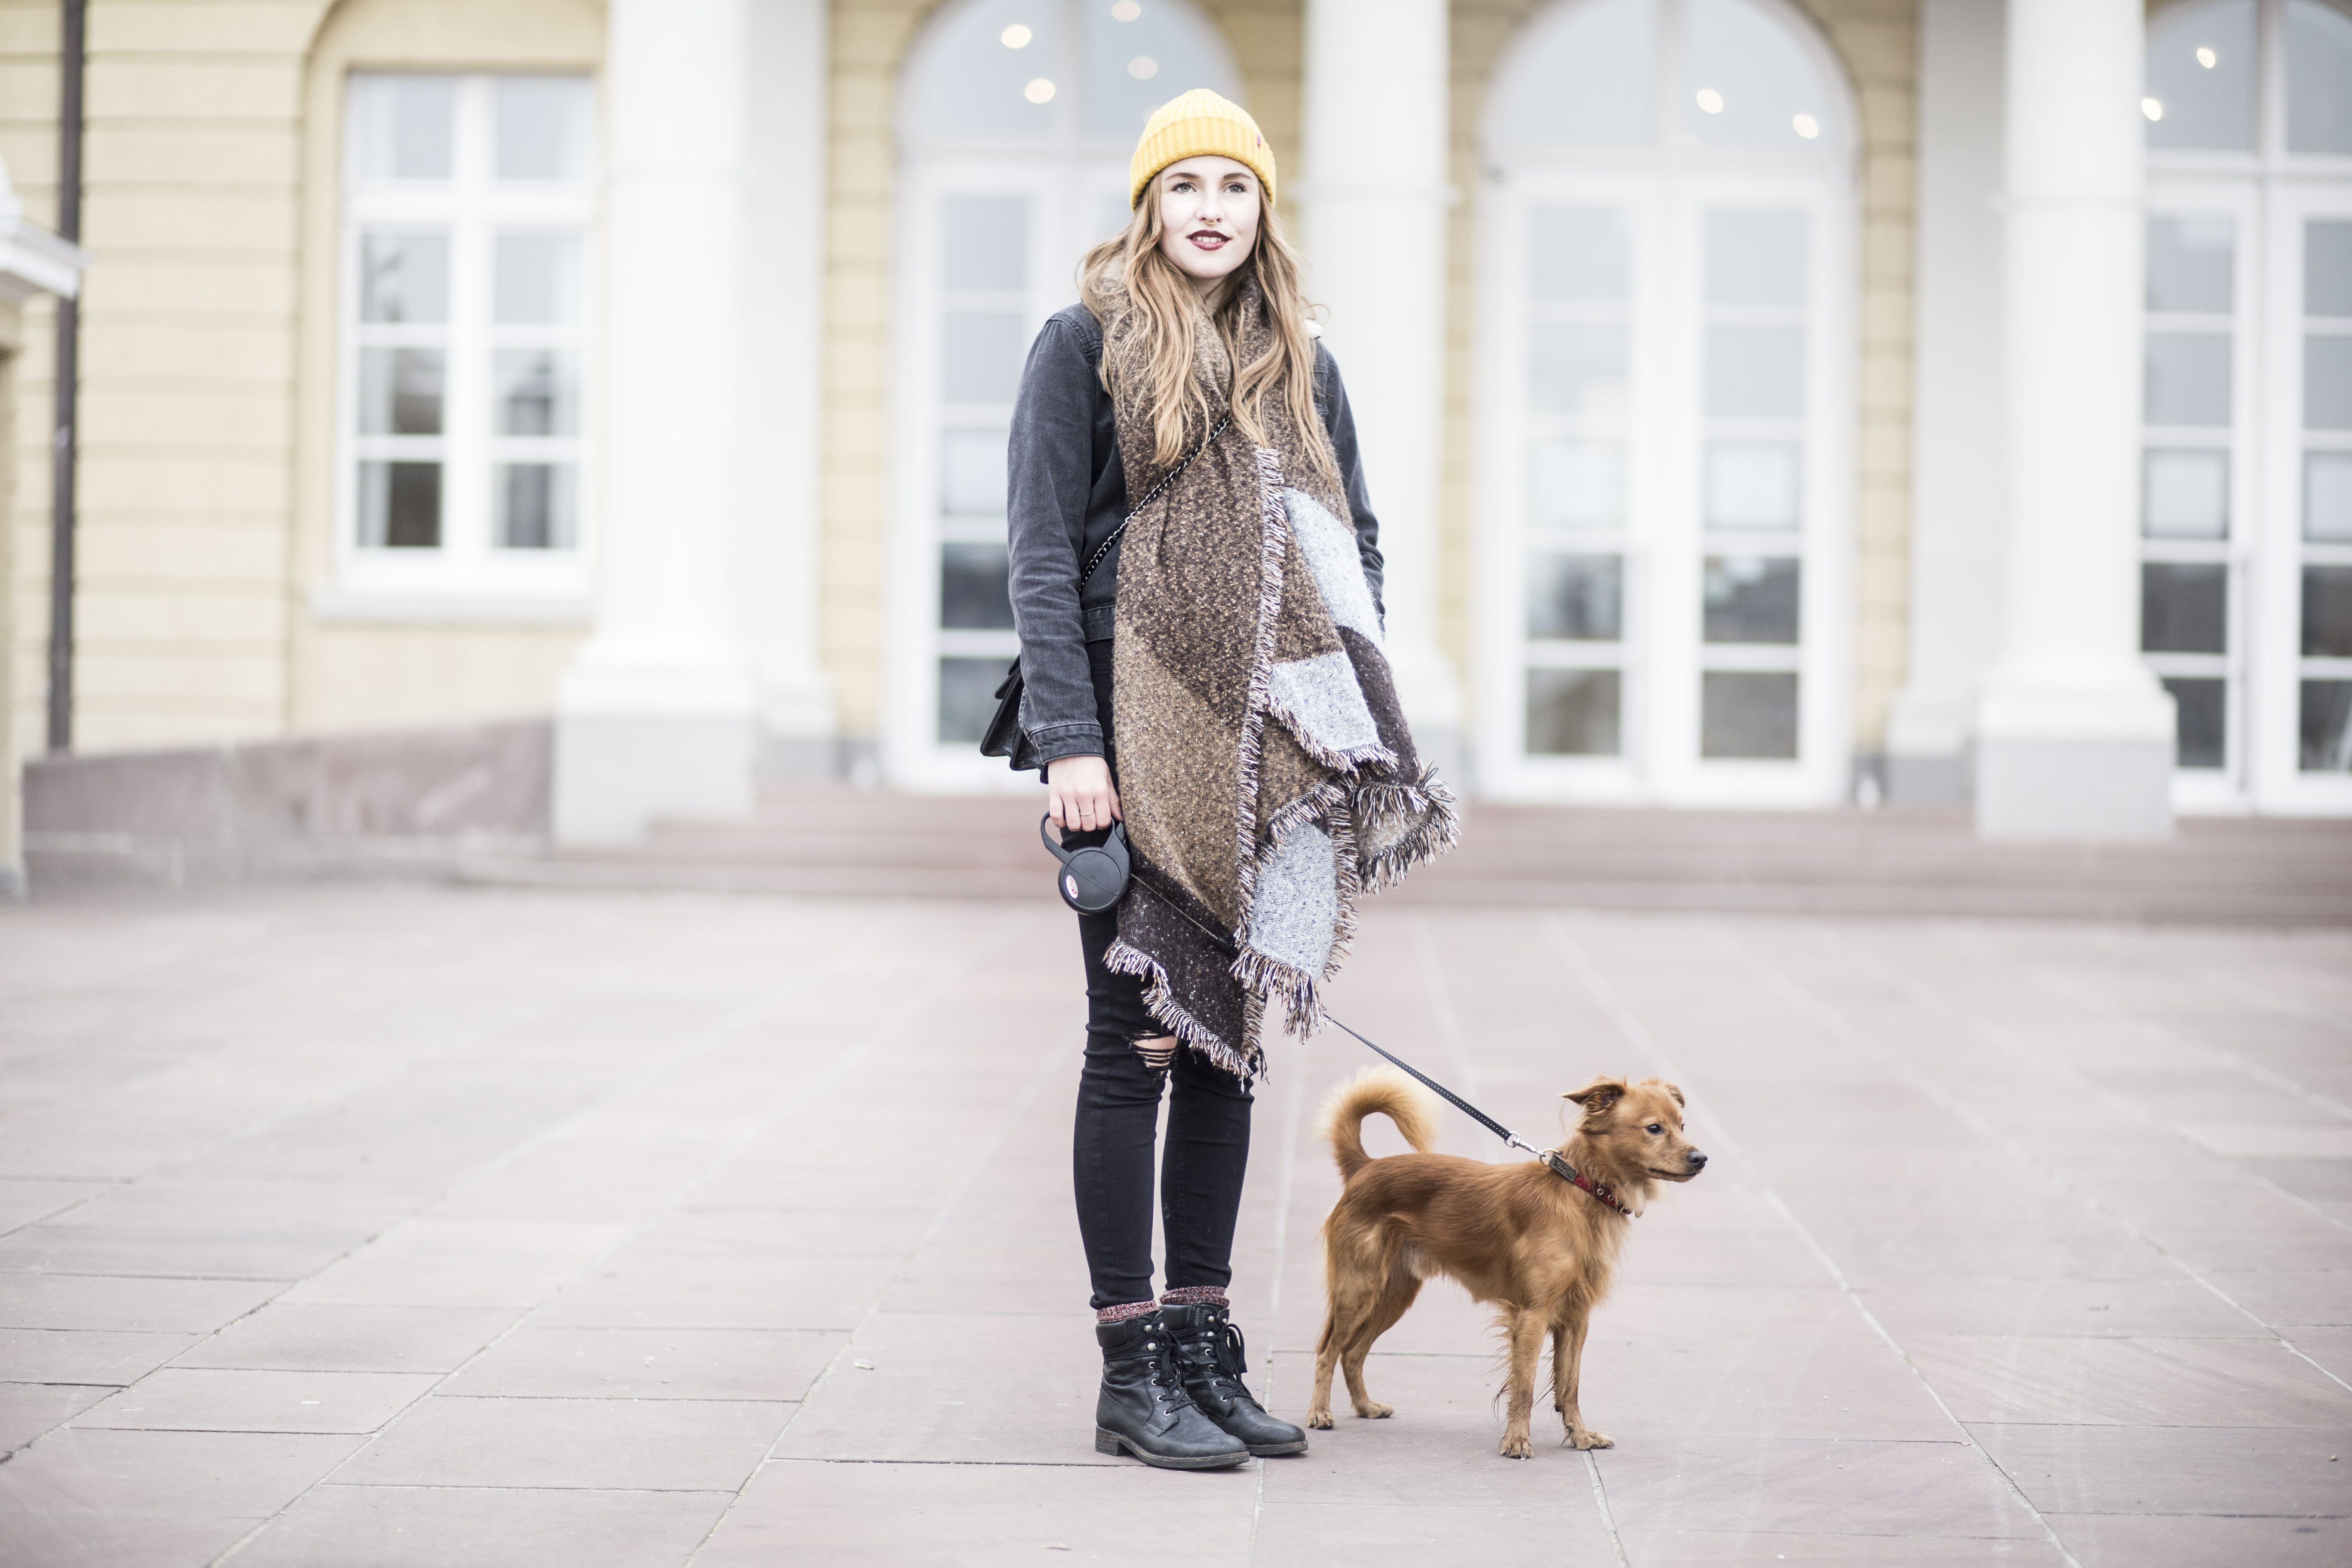 sassy-classy-scarf_23